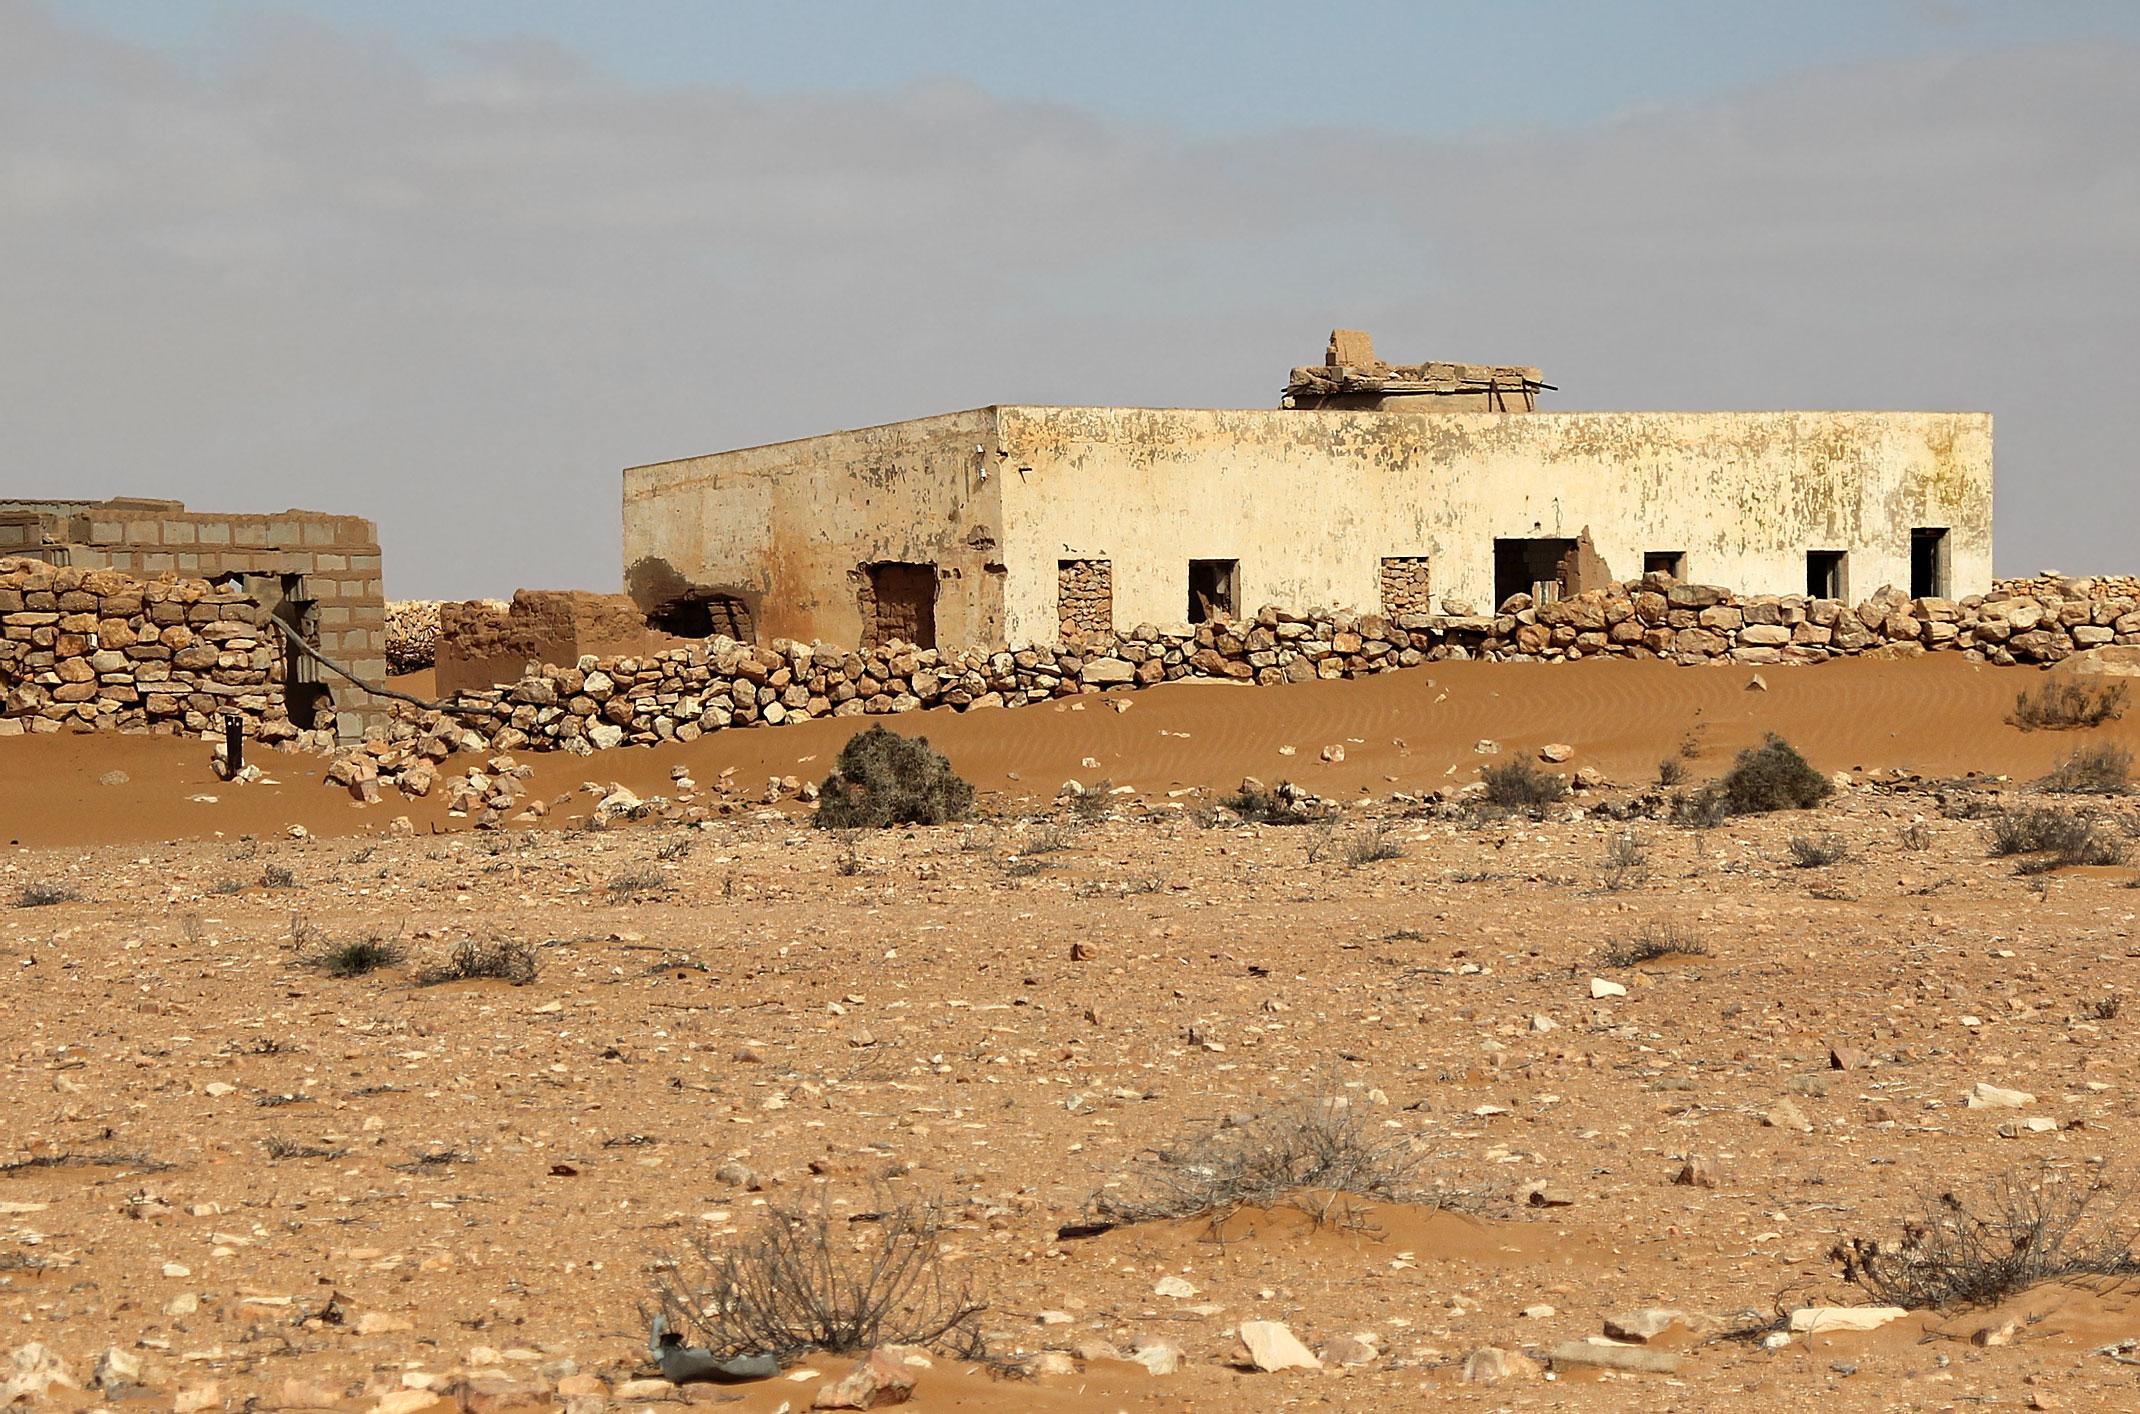 Sahara Zachodnia.Stary kolonialny fort El- Hagunia